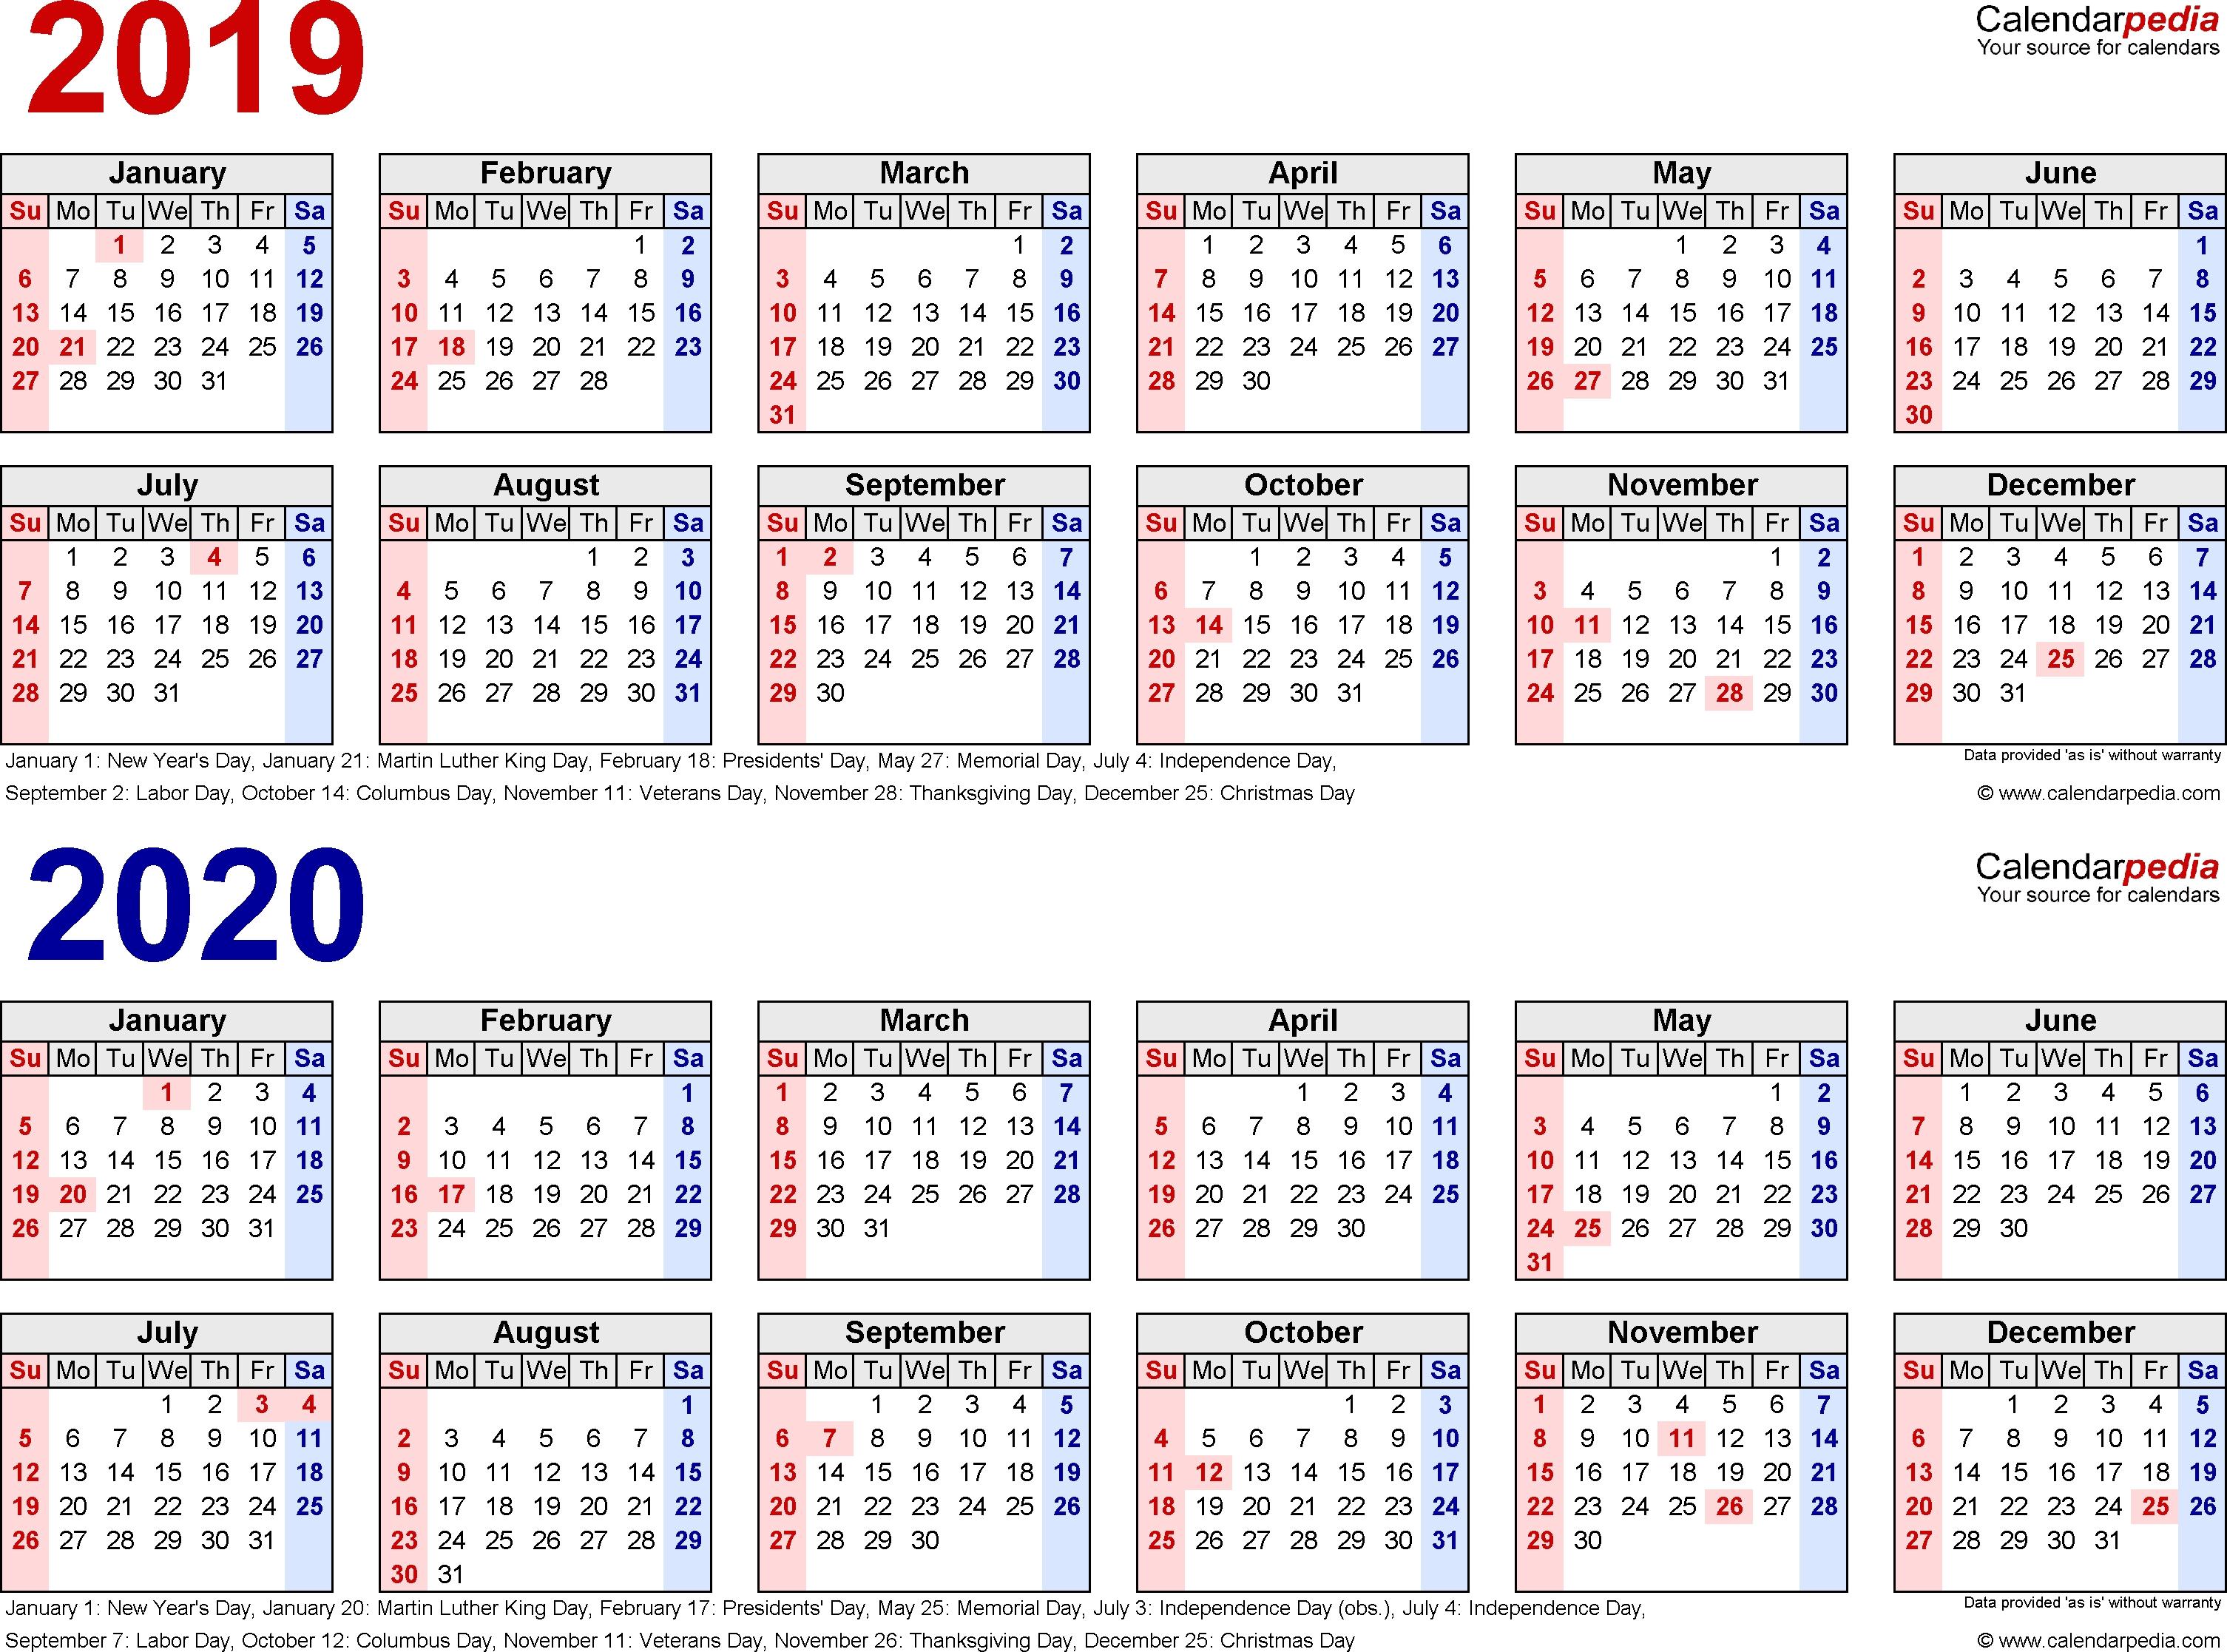 2019-2020 Calendar - Free Printable Two-Year Word Calendars in Free Calendar July 2019-June 2020